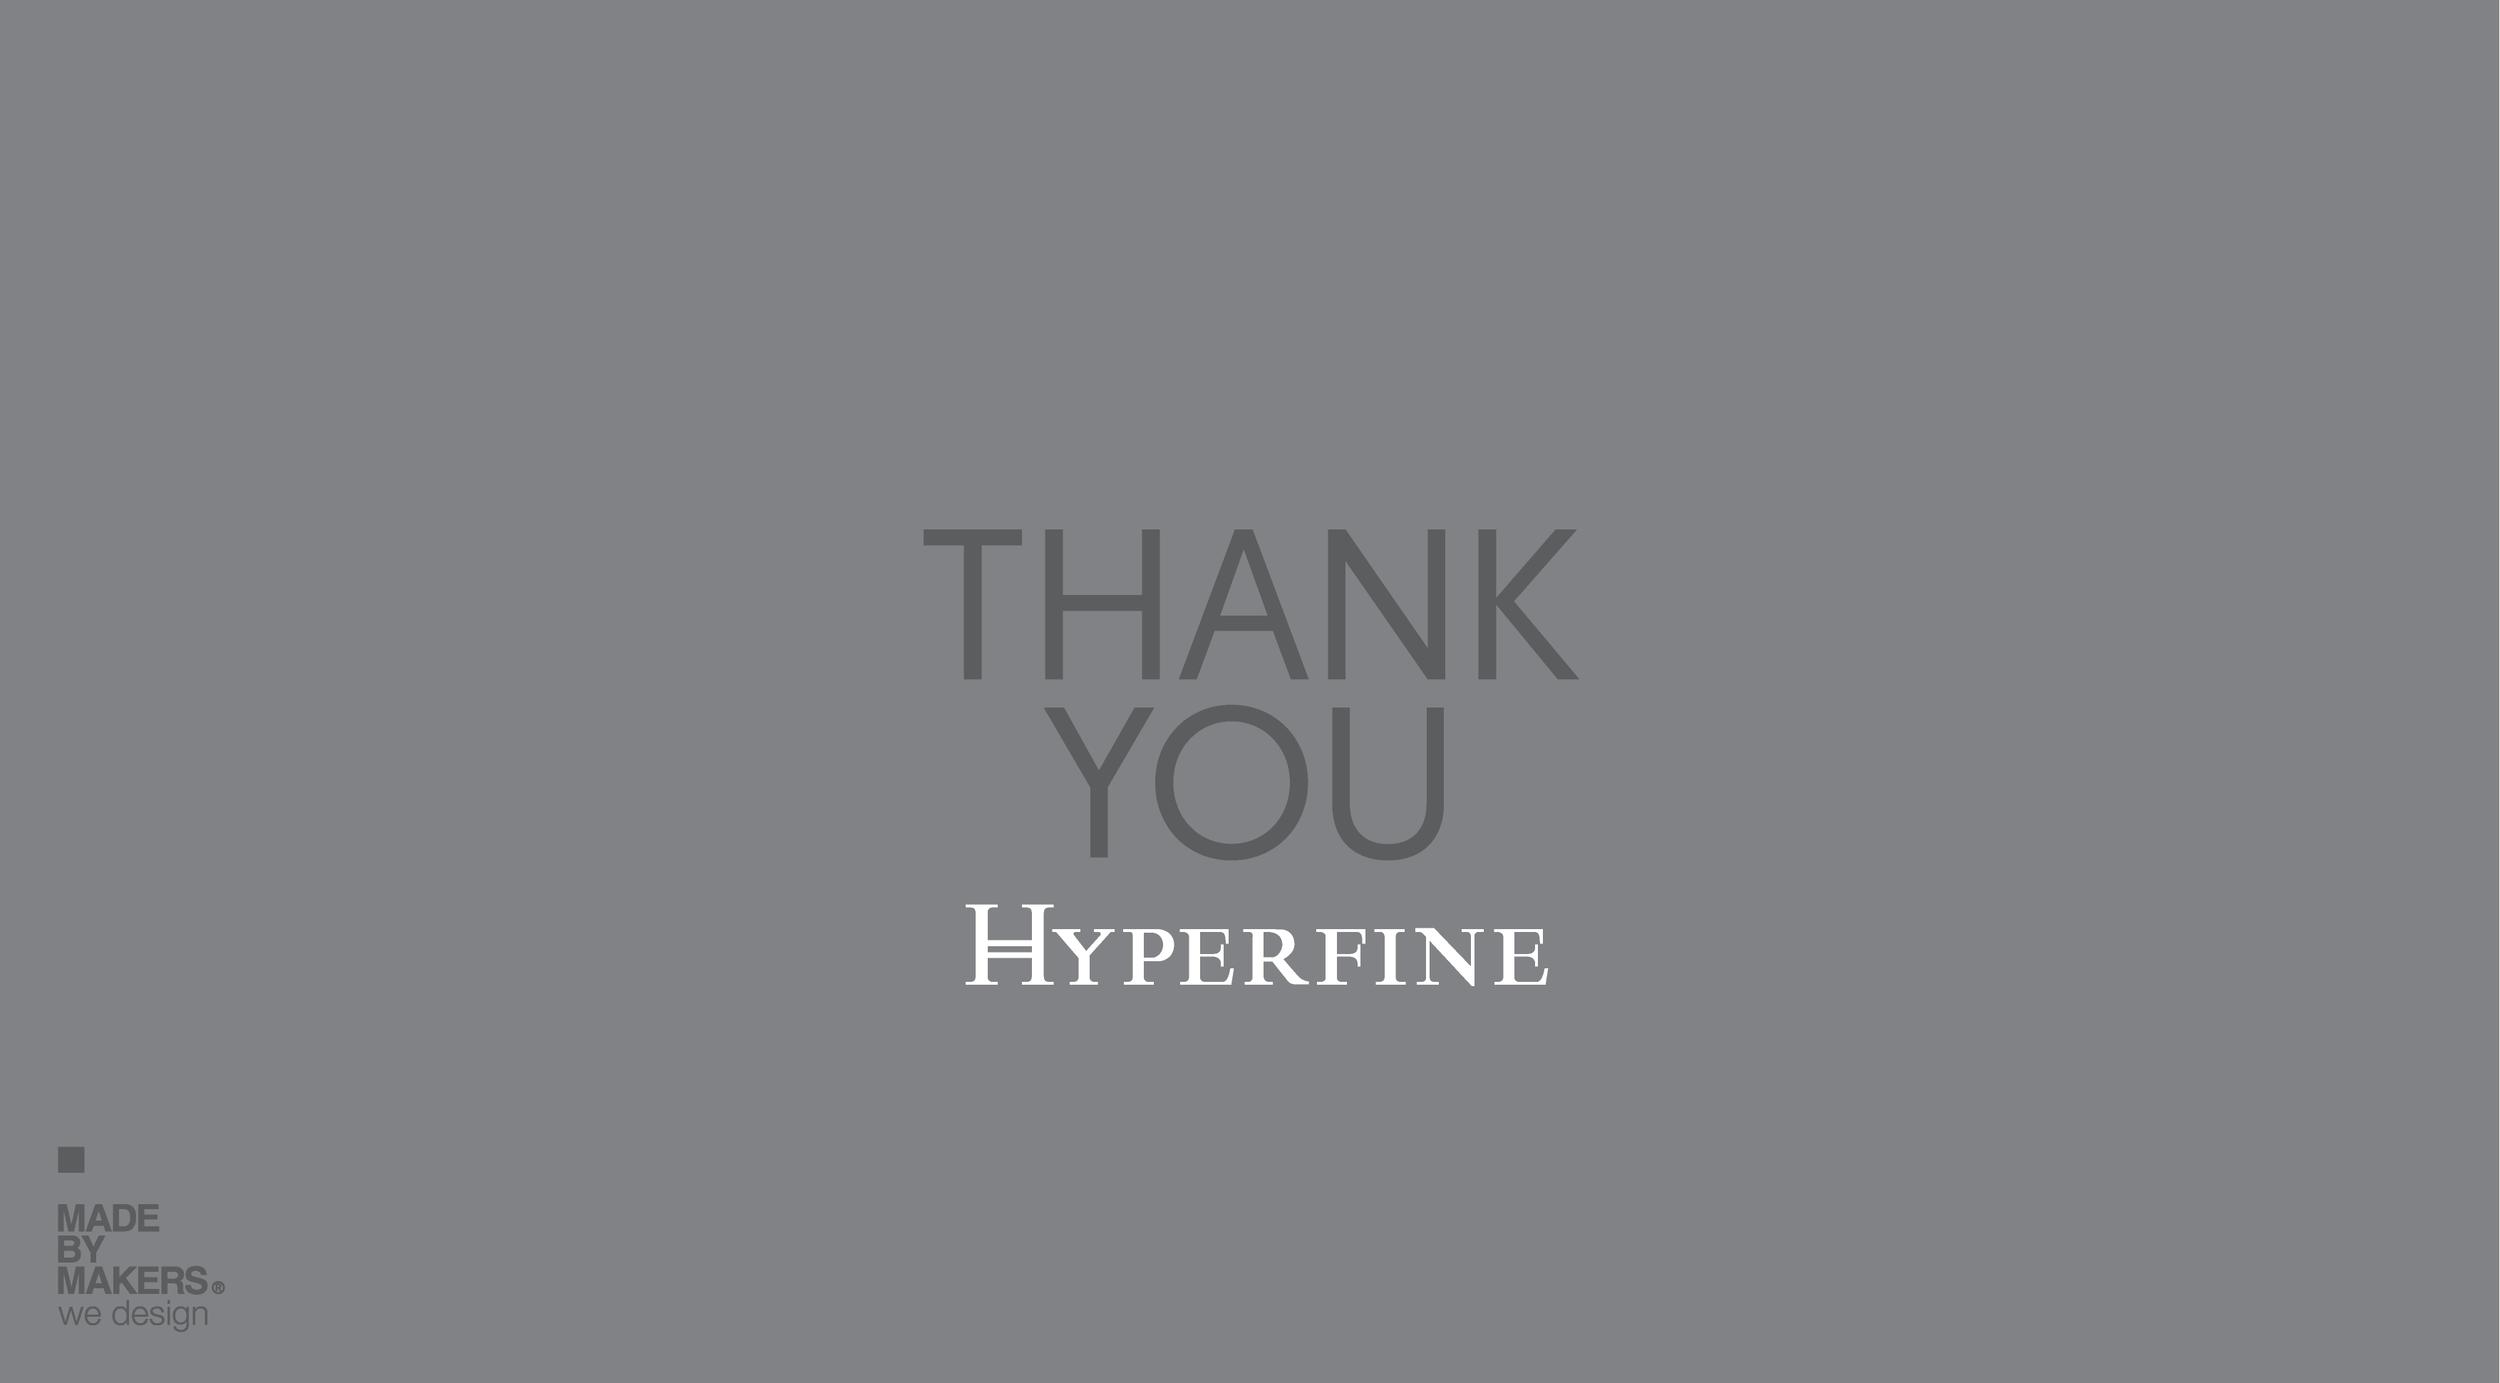 Hyperfine + MBM